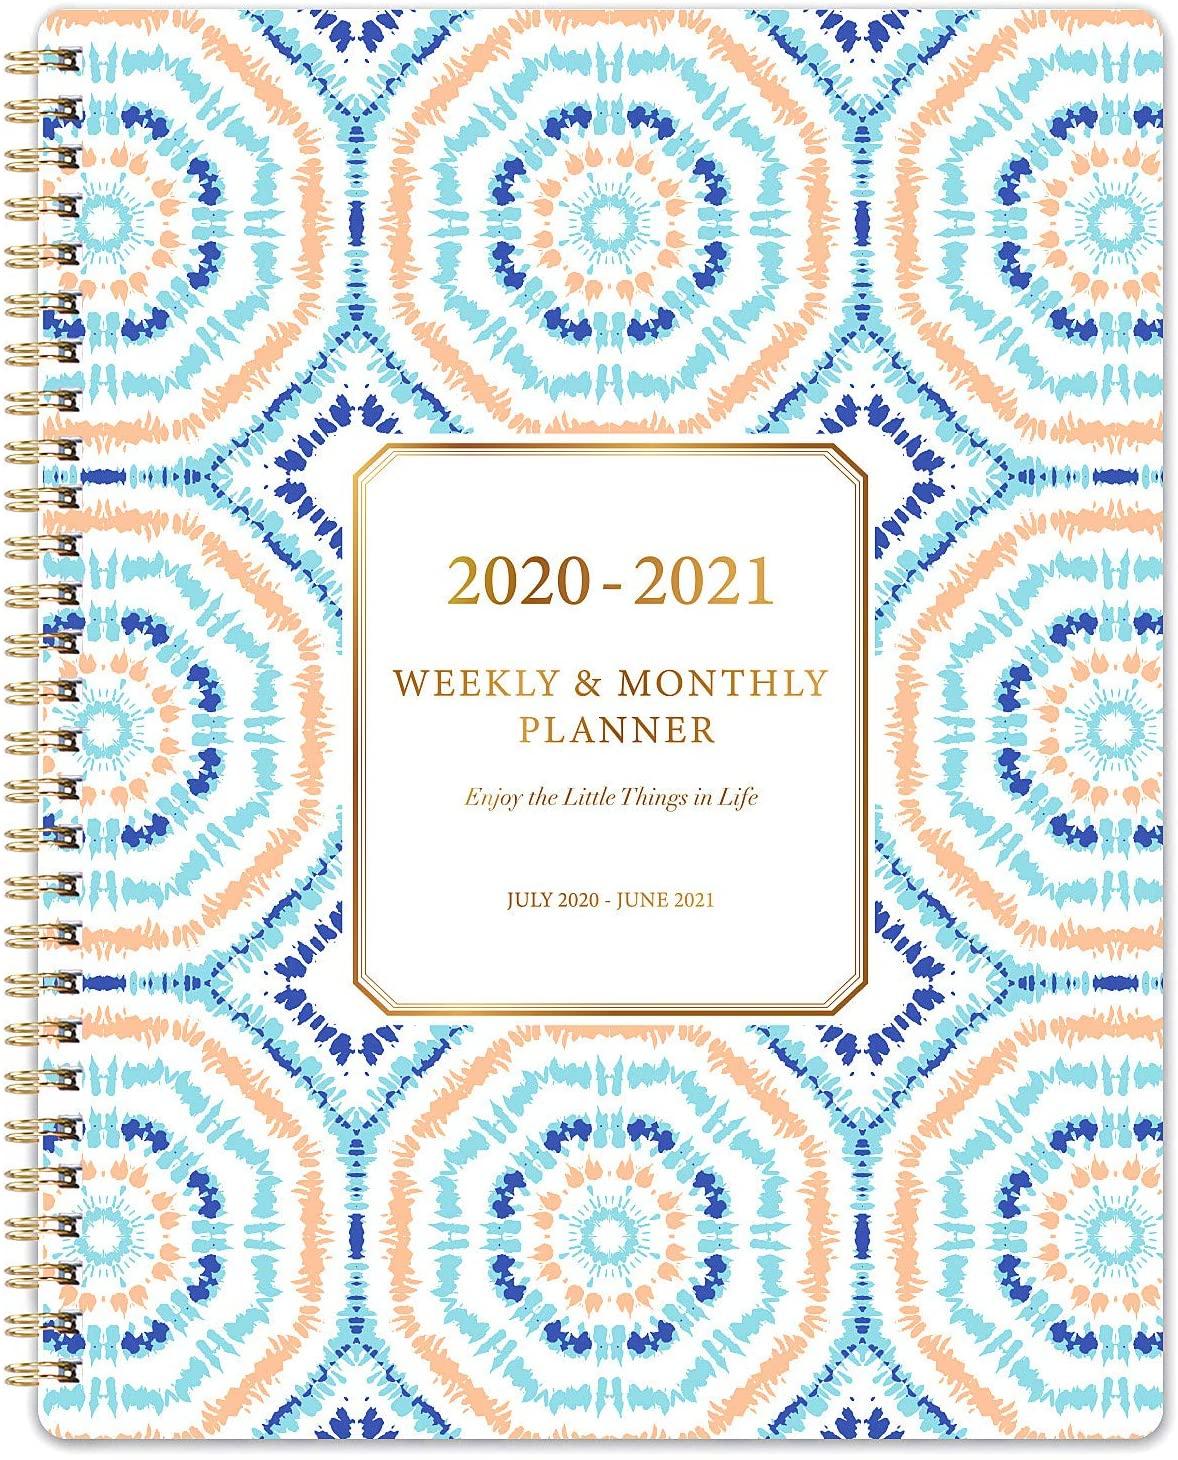 Planner 2020-2021 - Academic 2020-2021 Planner 8